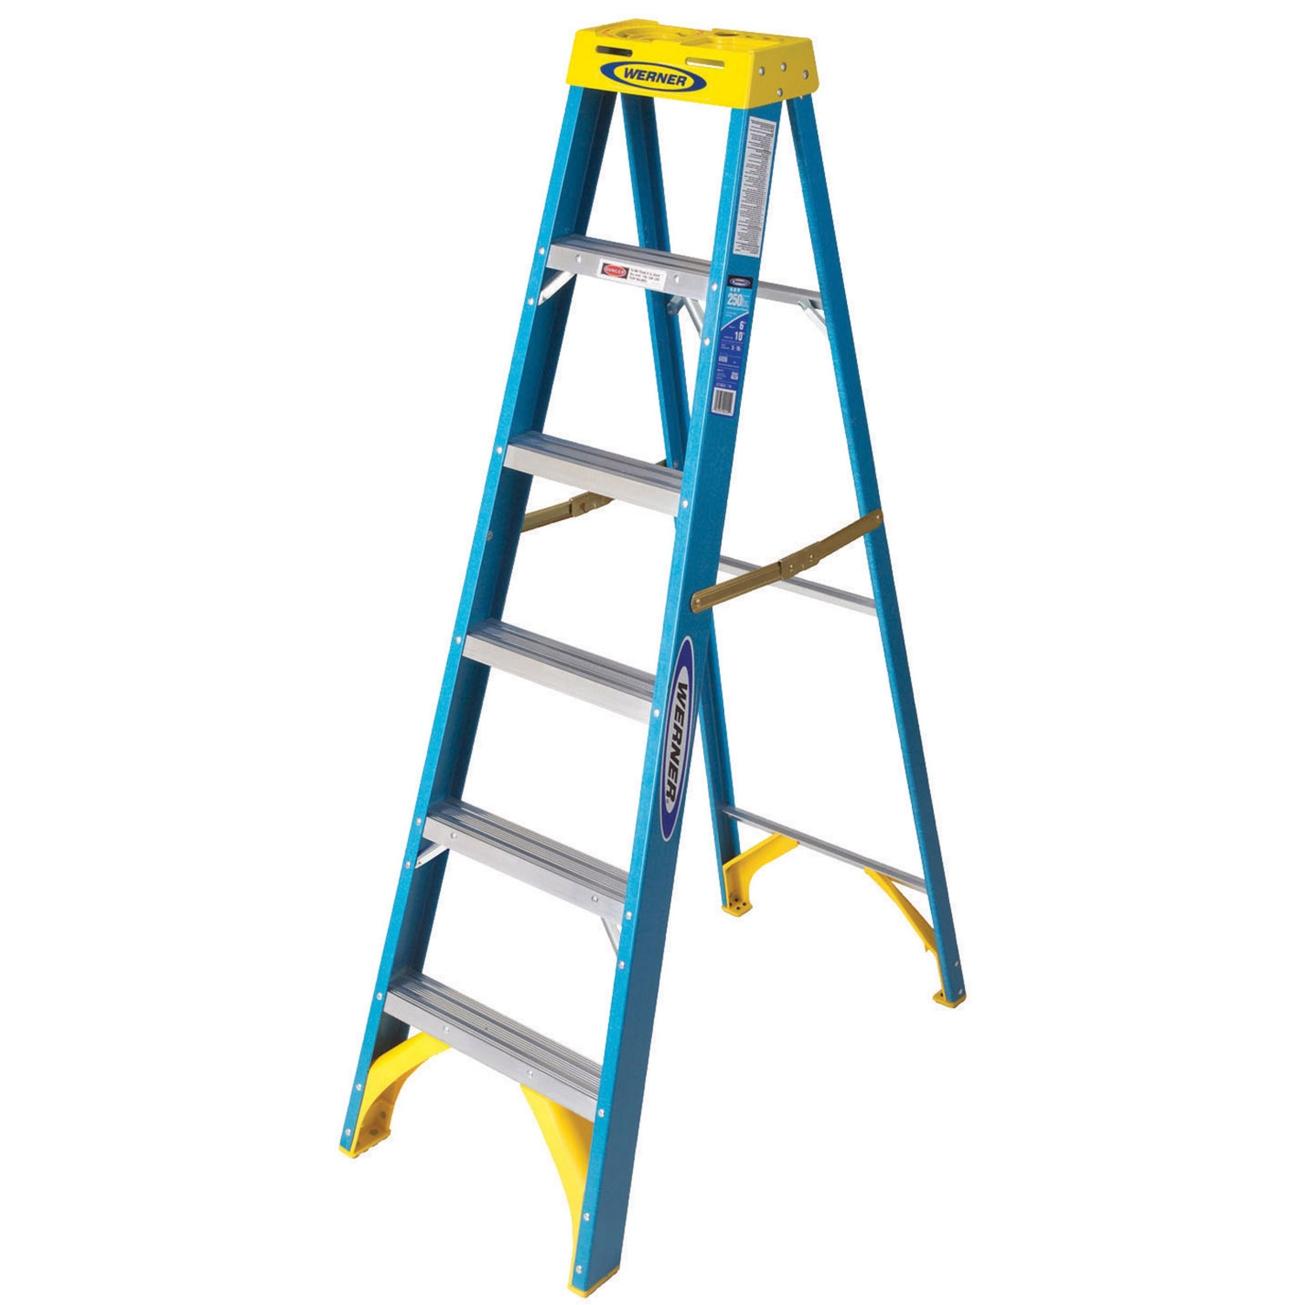 6 Foot Platform Ladder